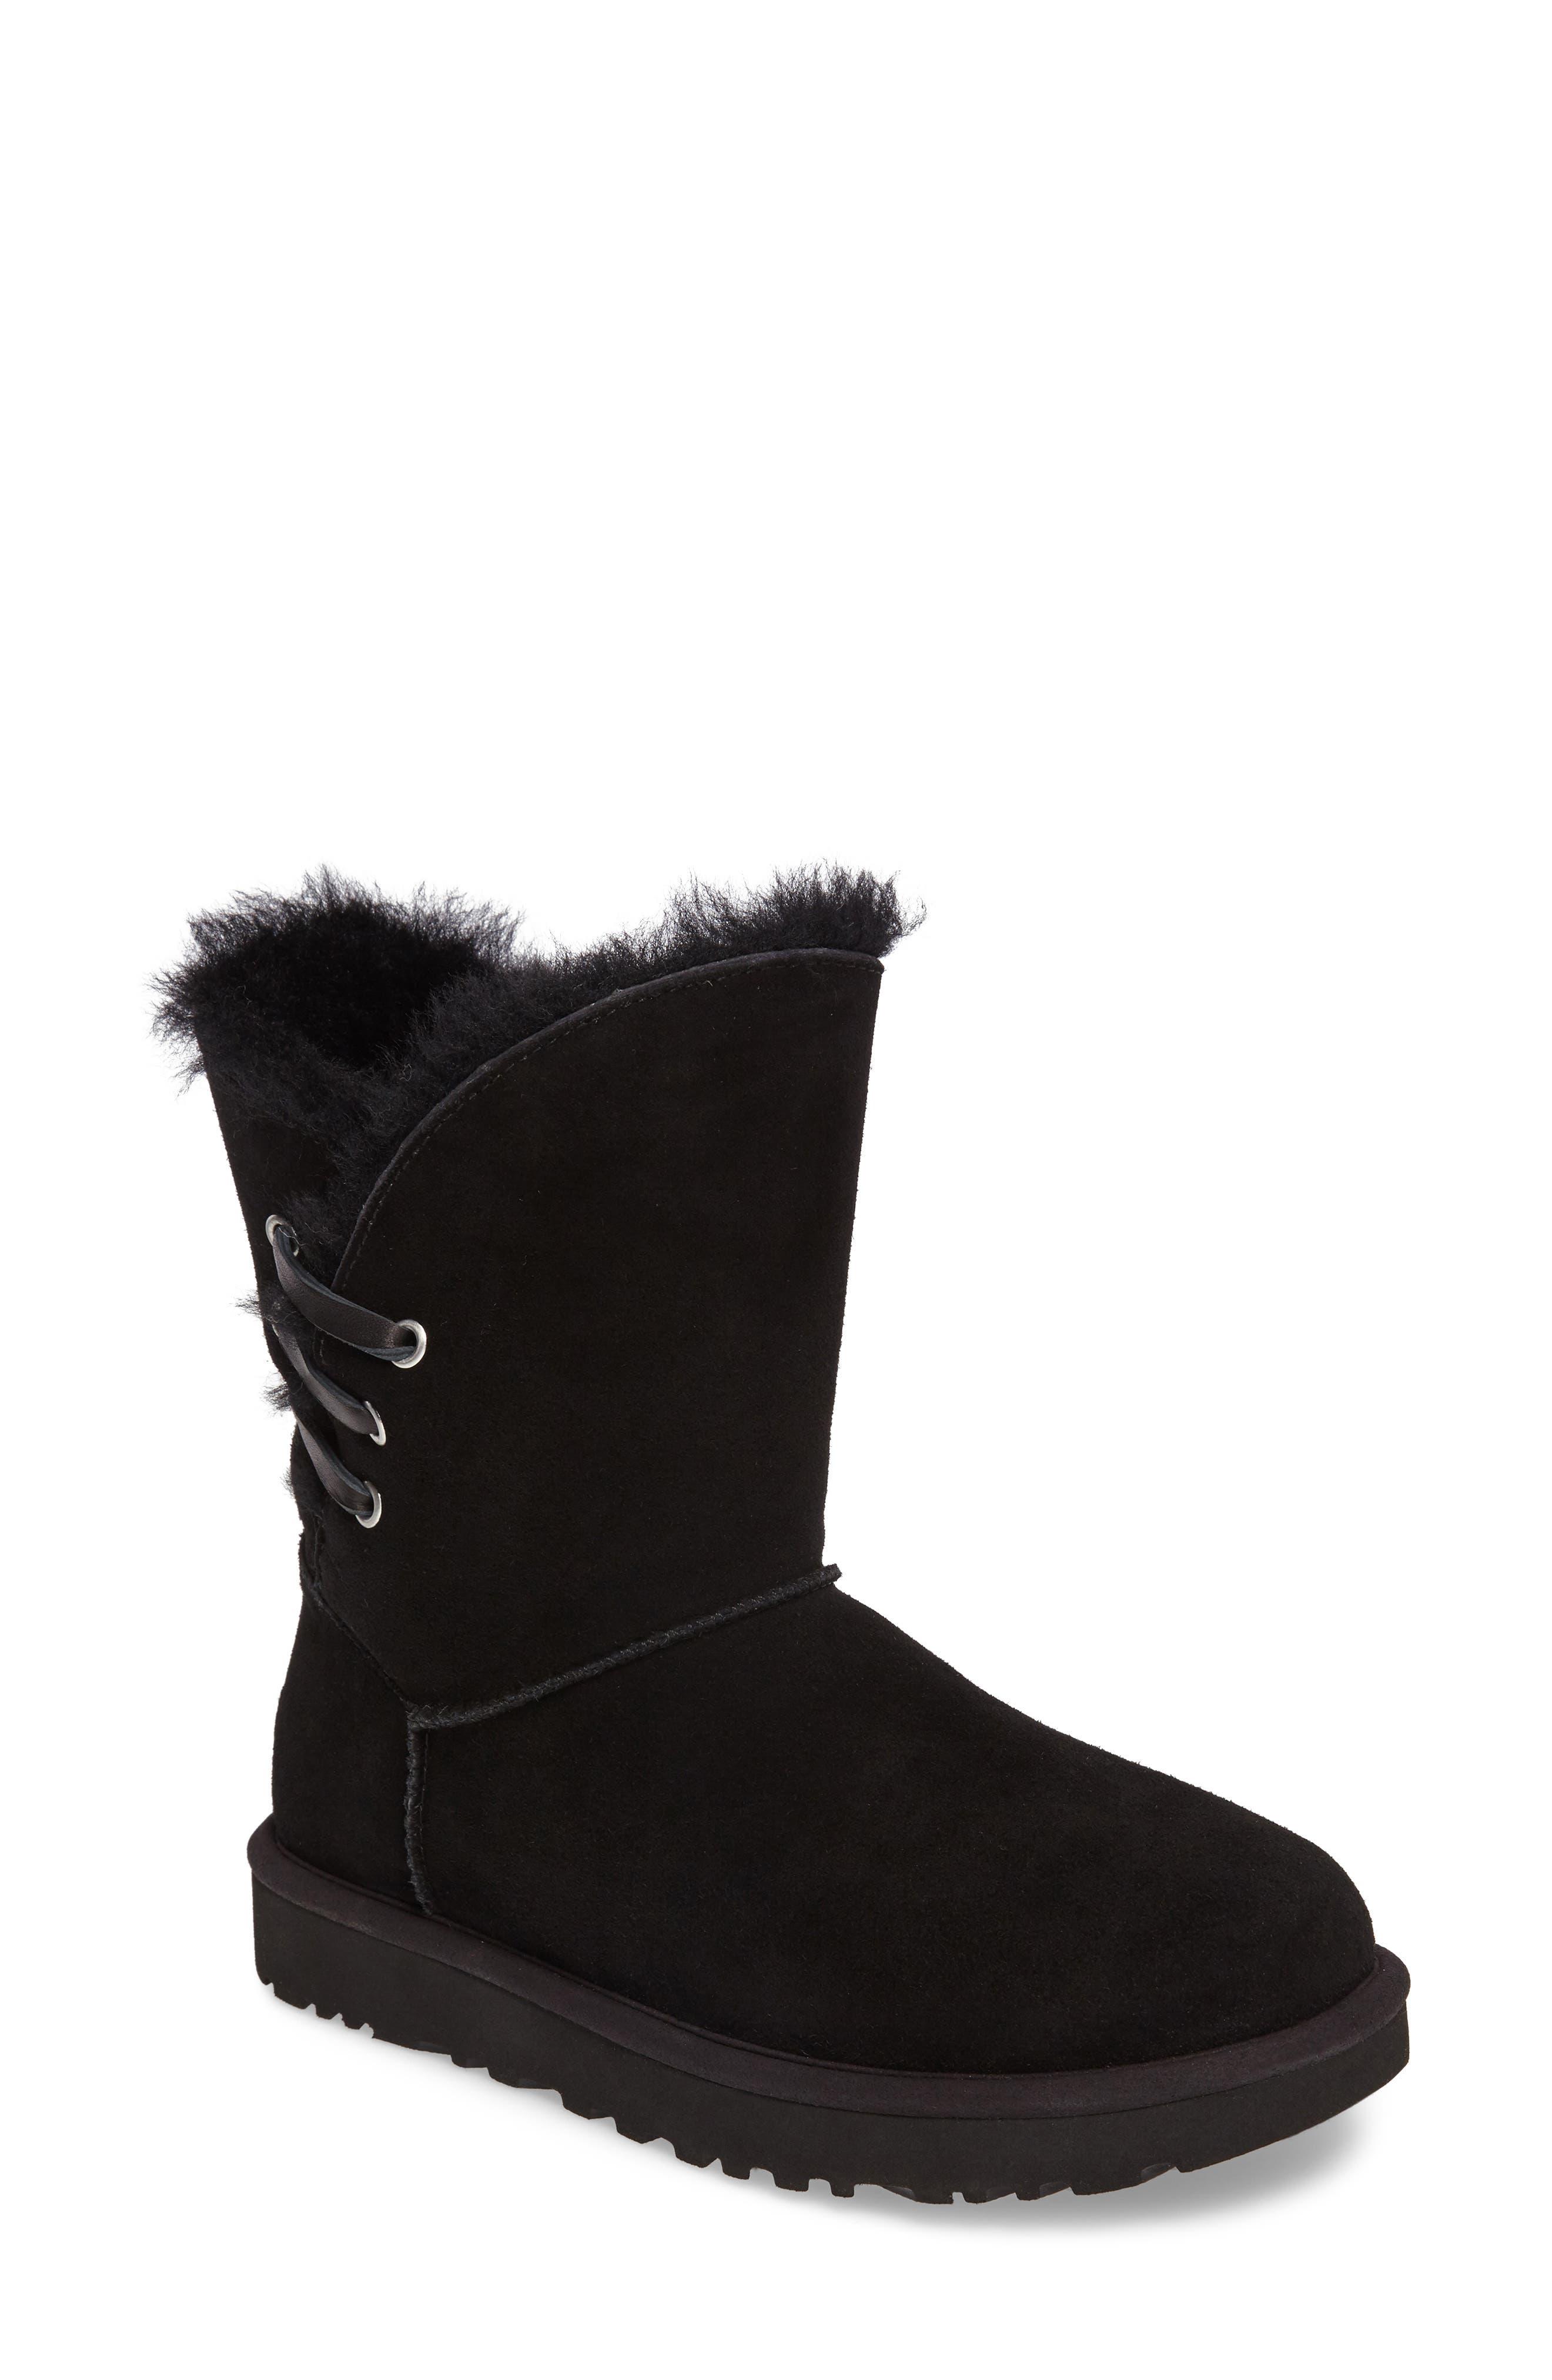 Main Image - UGG® Constantine Boot (Women)